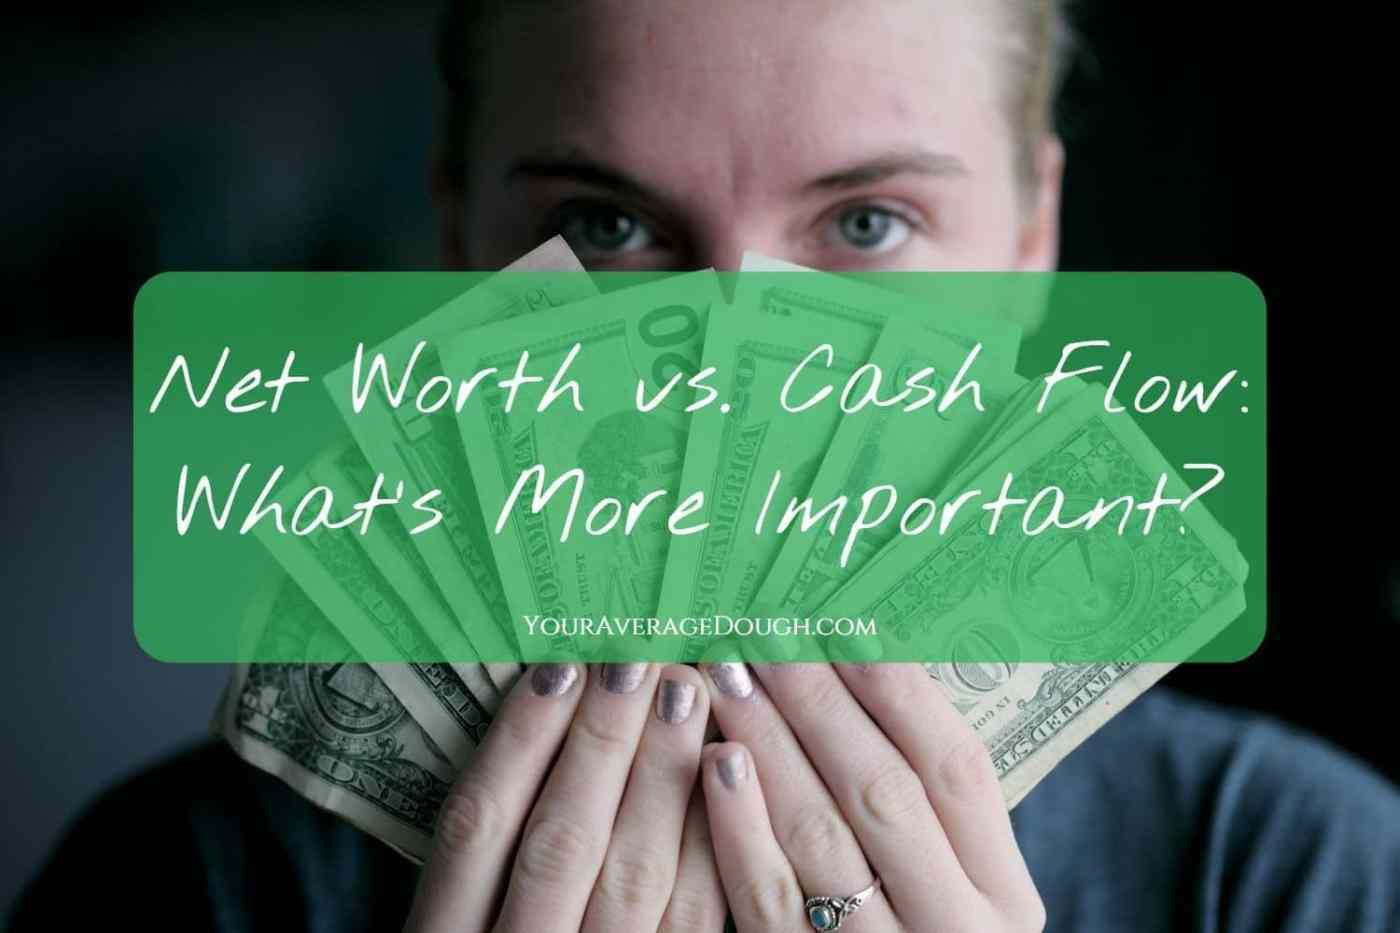 net worth vs cash flow